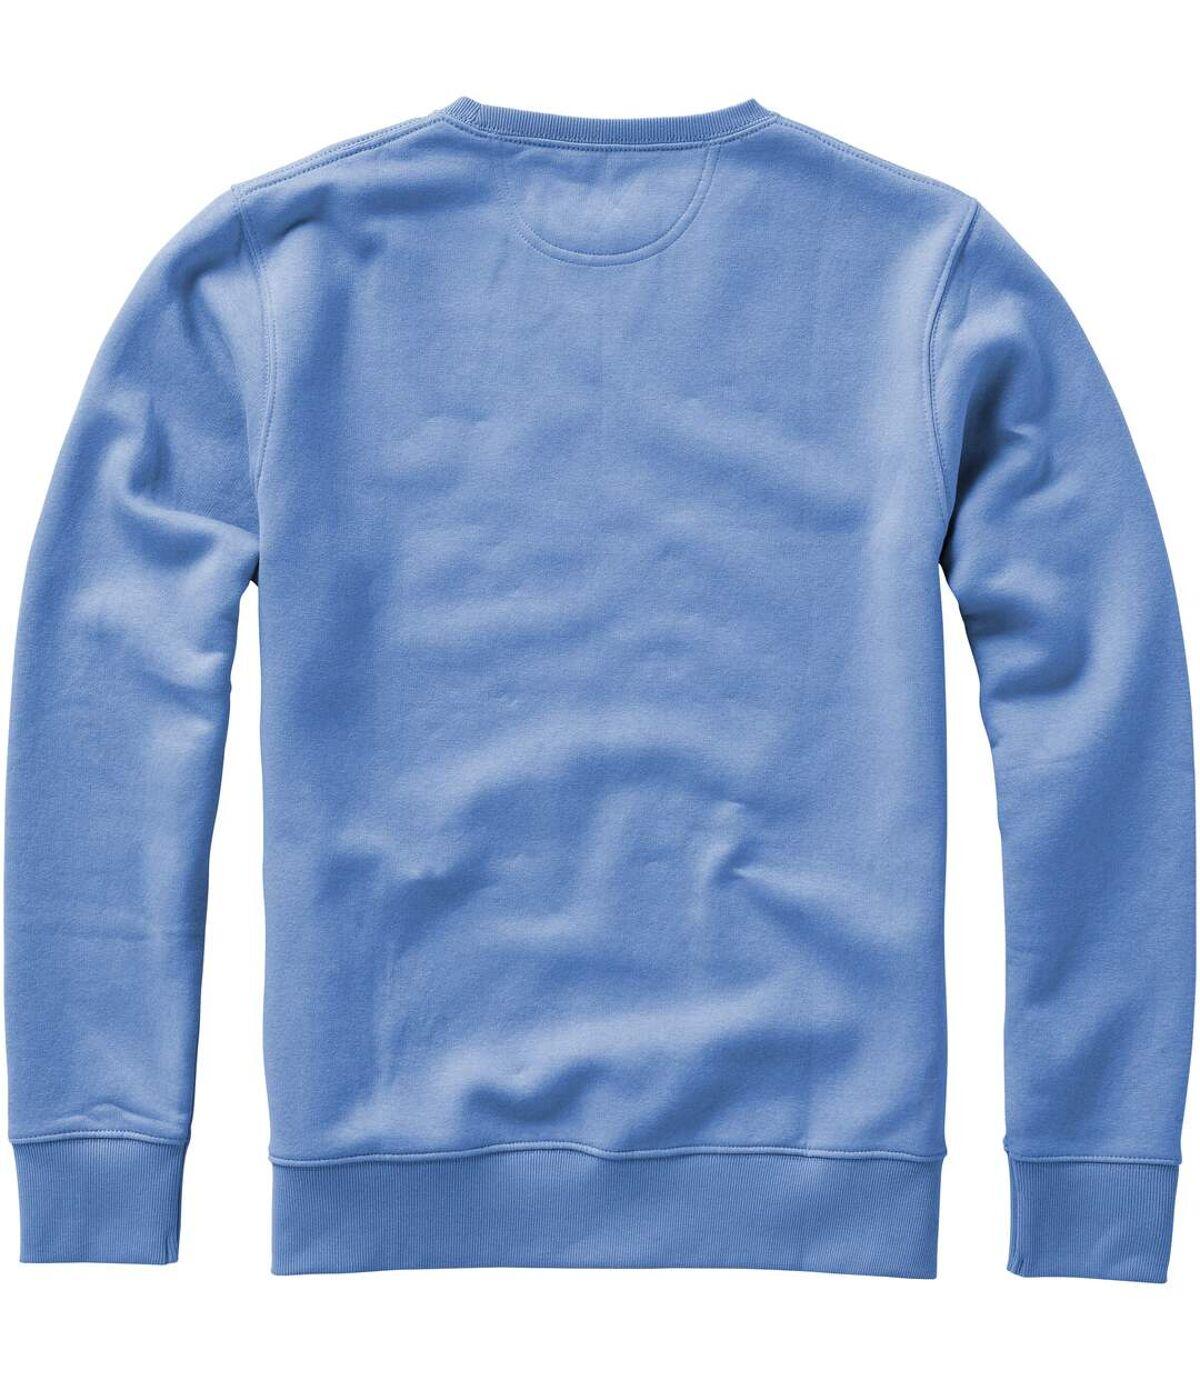 Elevate Mens Surrey Crew Neck Sweater (Red) - UTPF1849